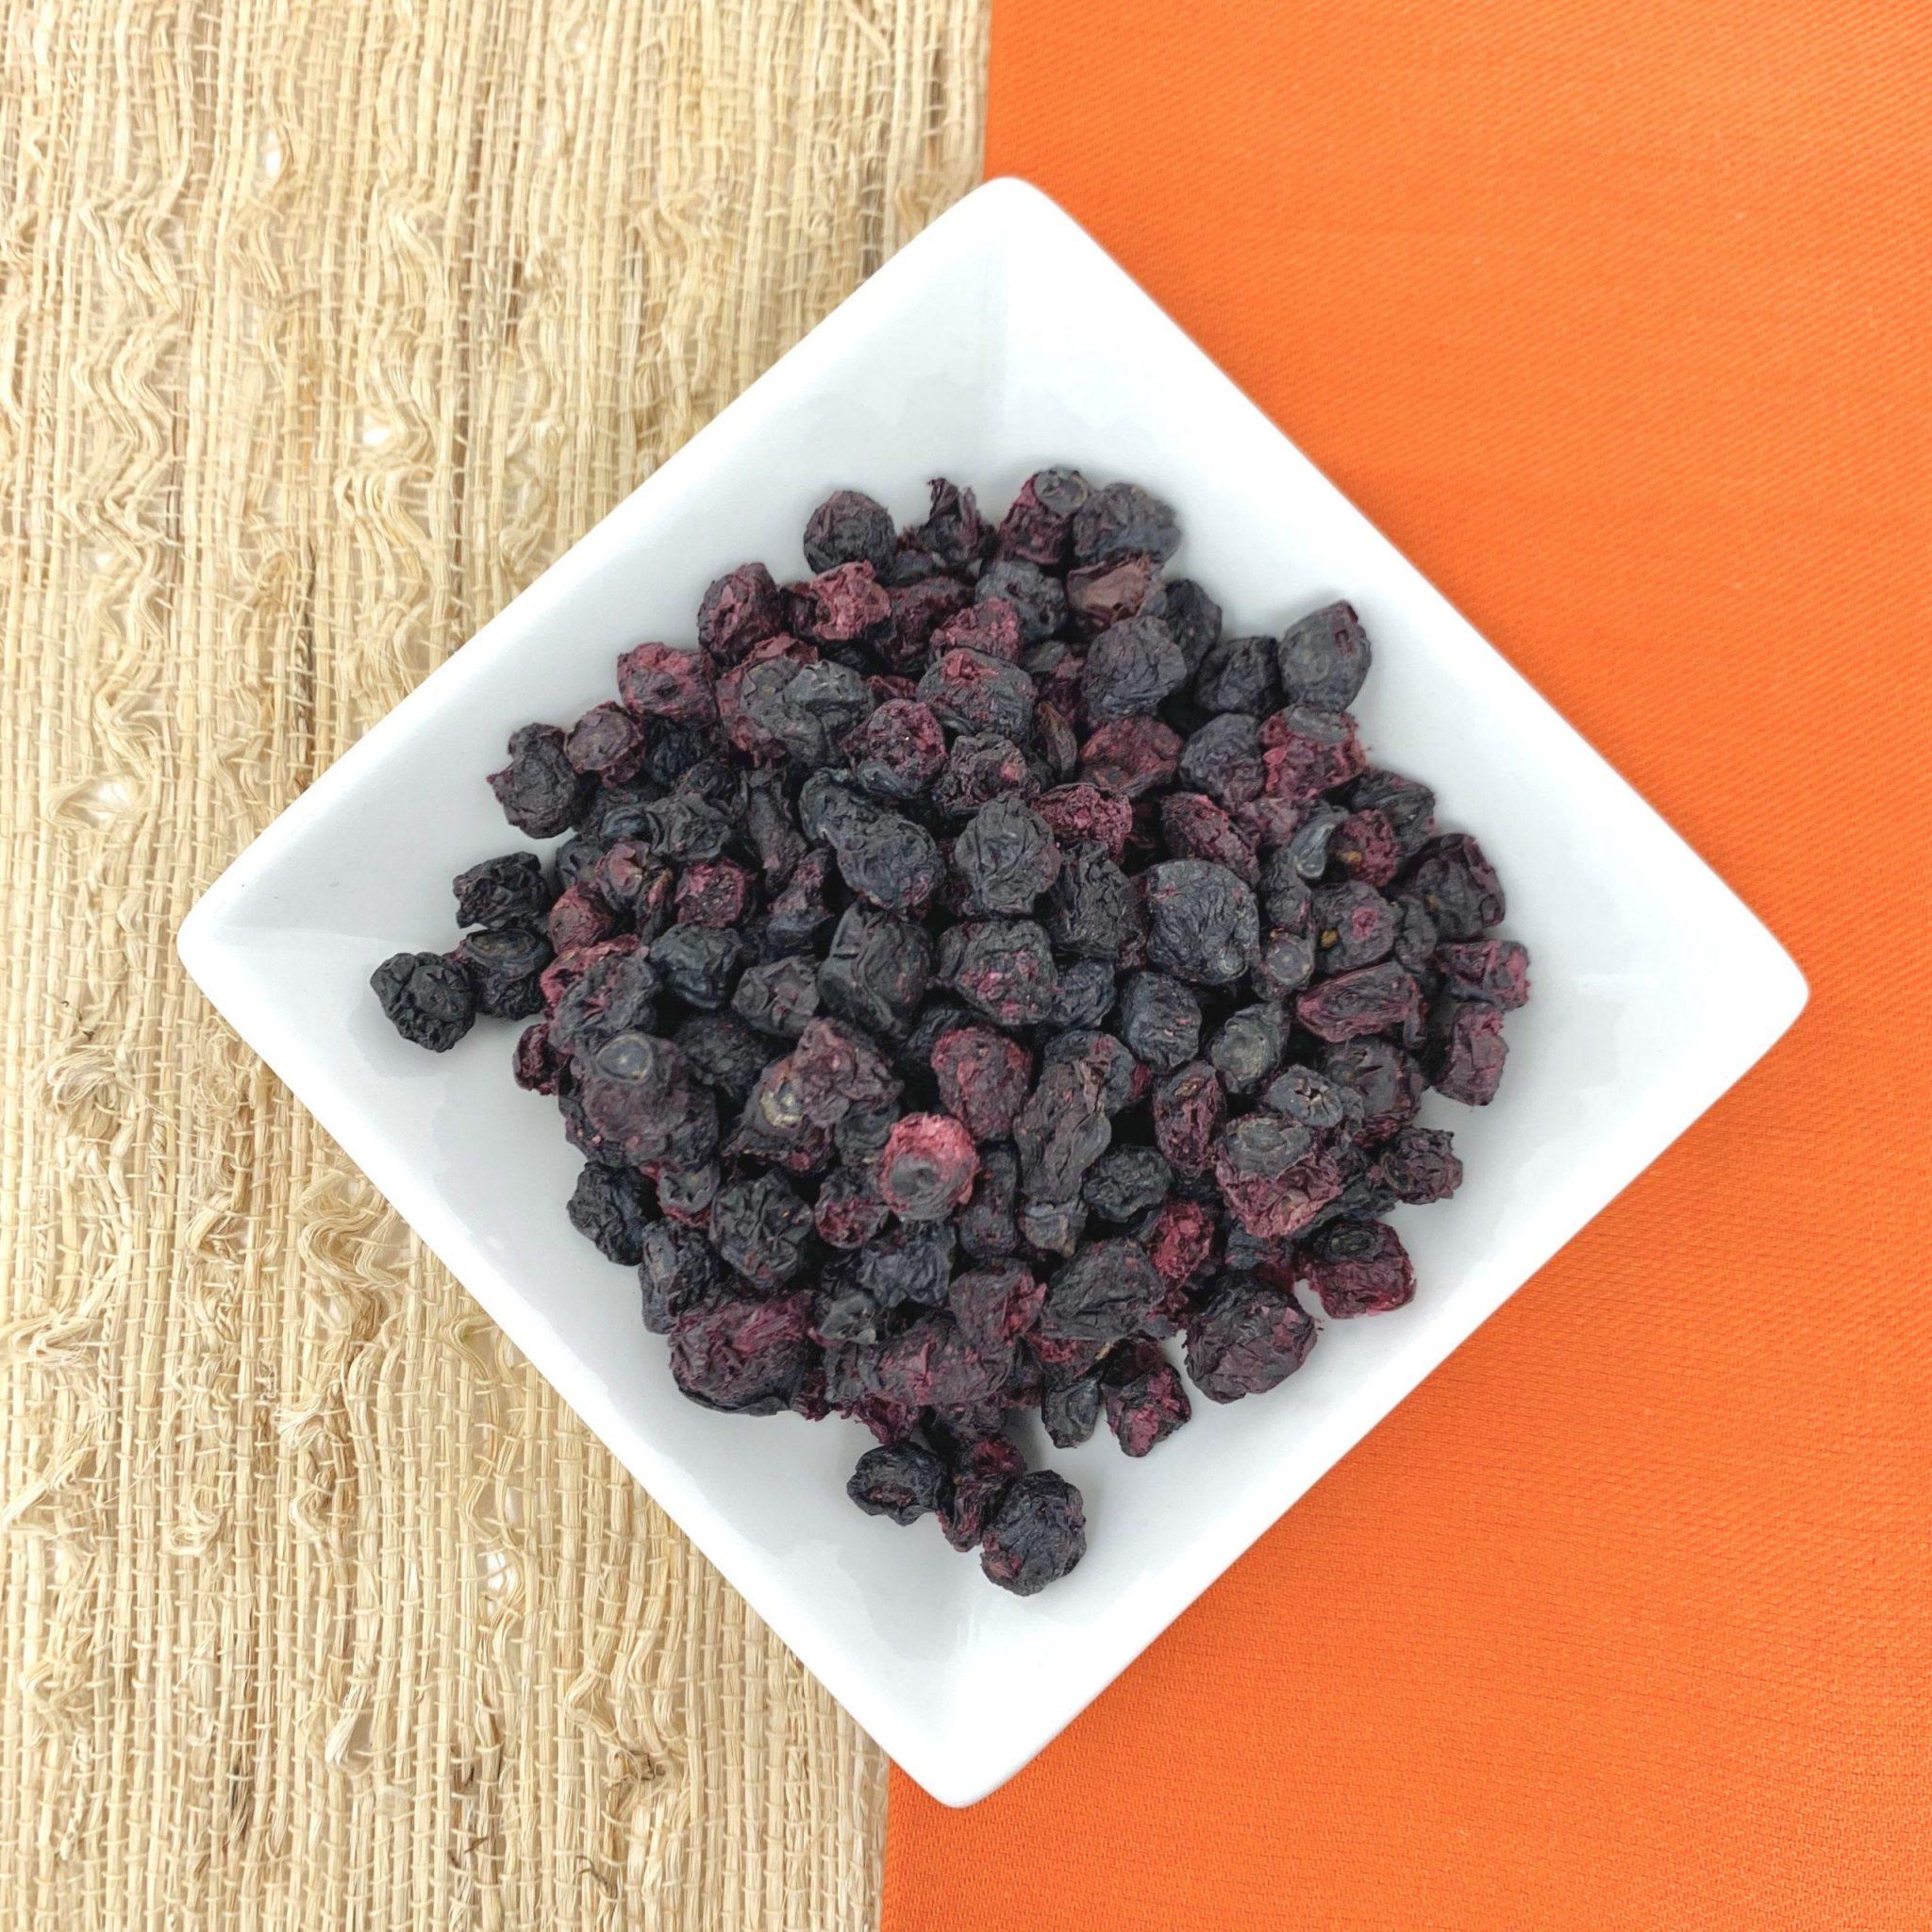 whole air dried blueberries